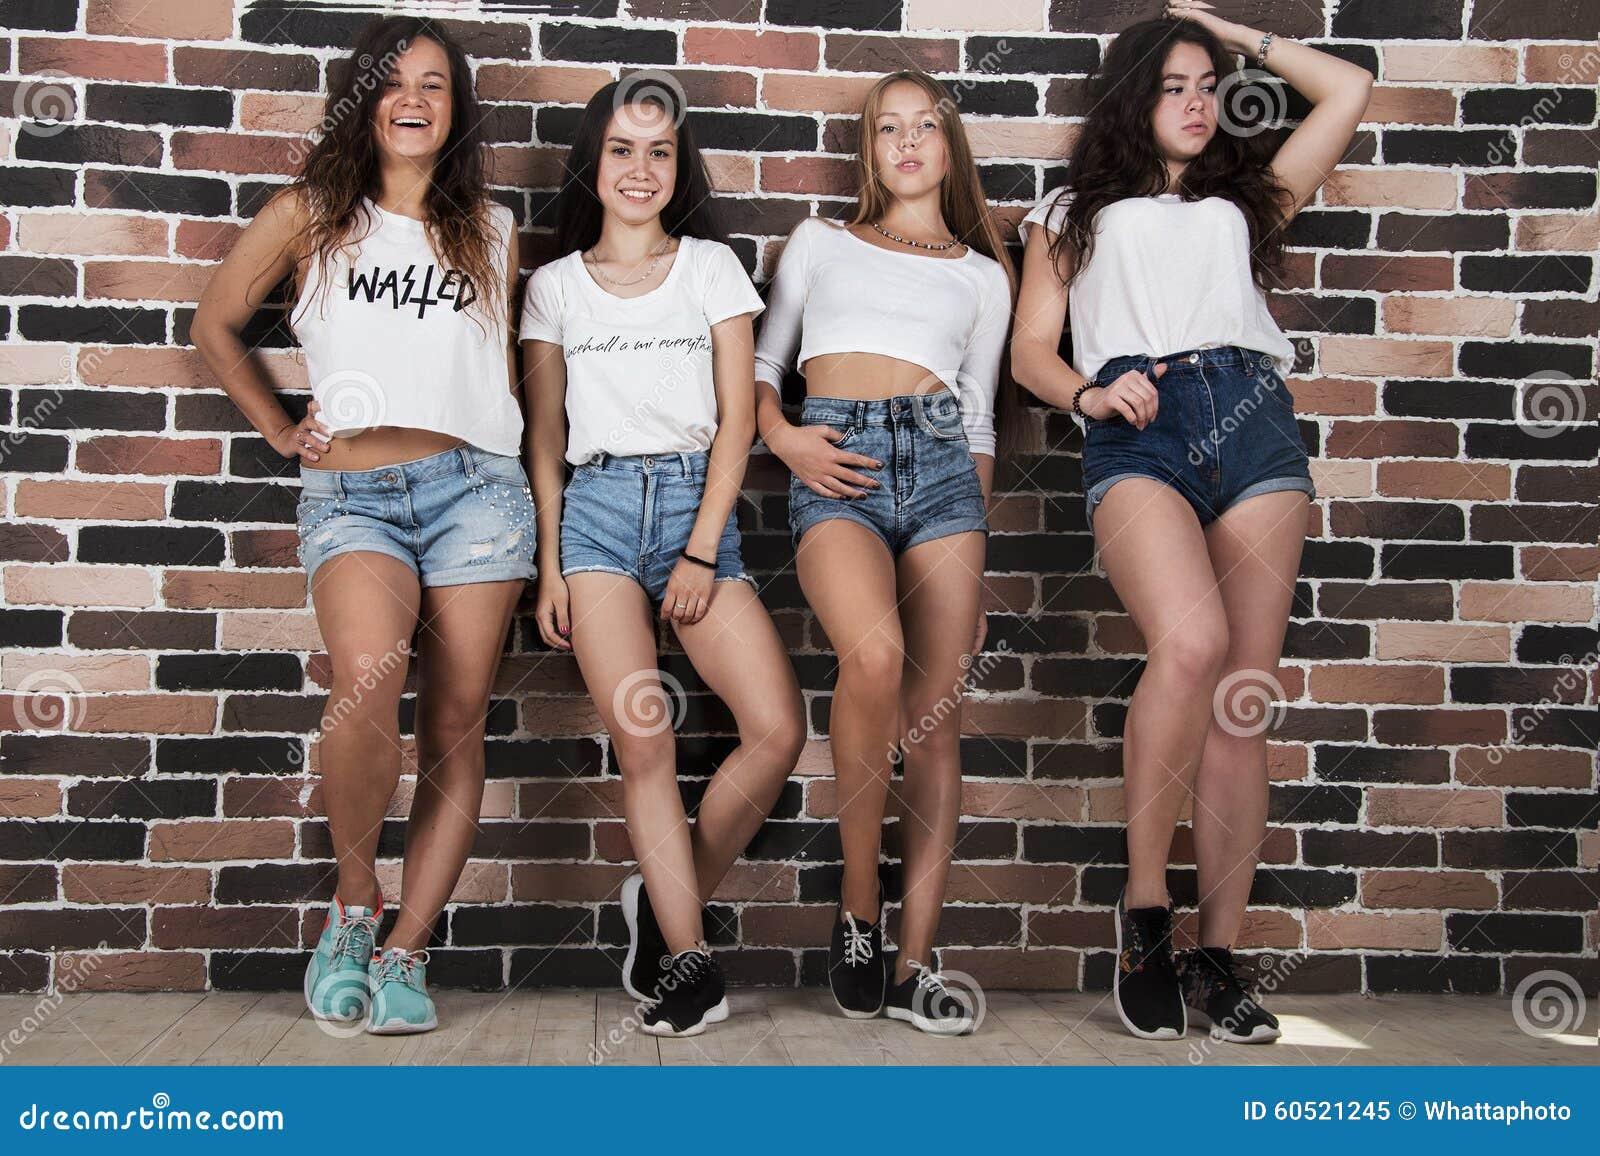 Teen babes σεξ φωτογραφίες